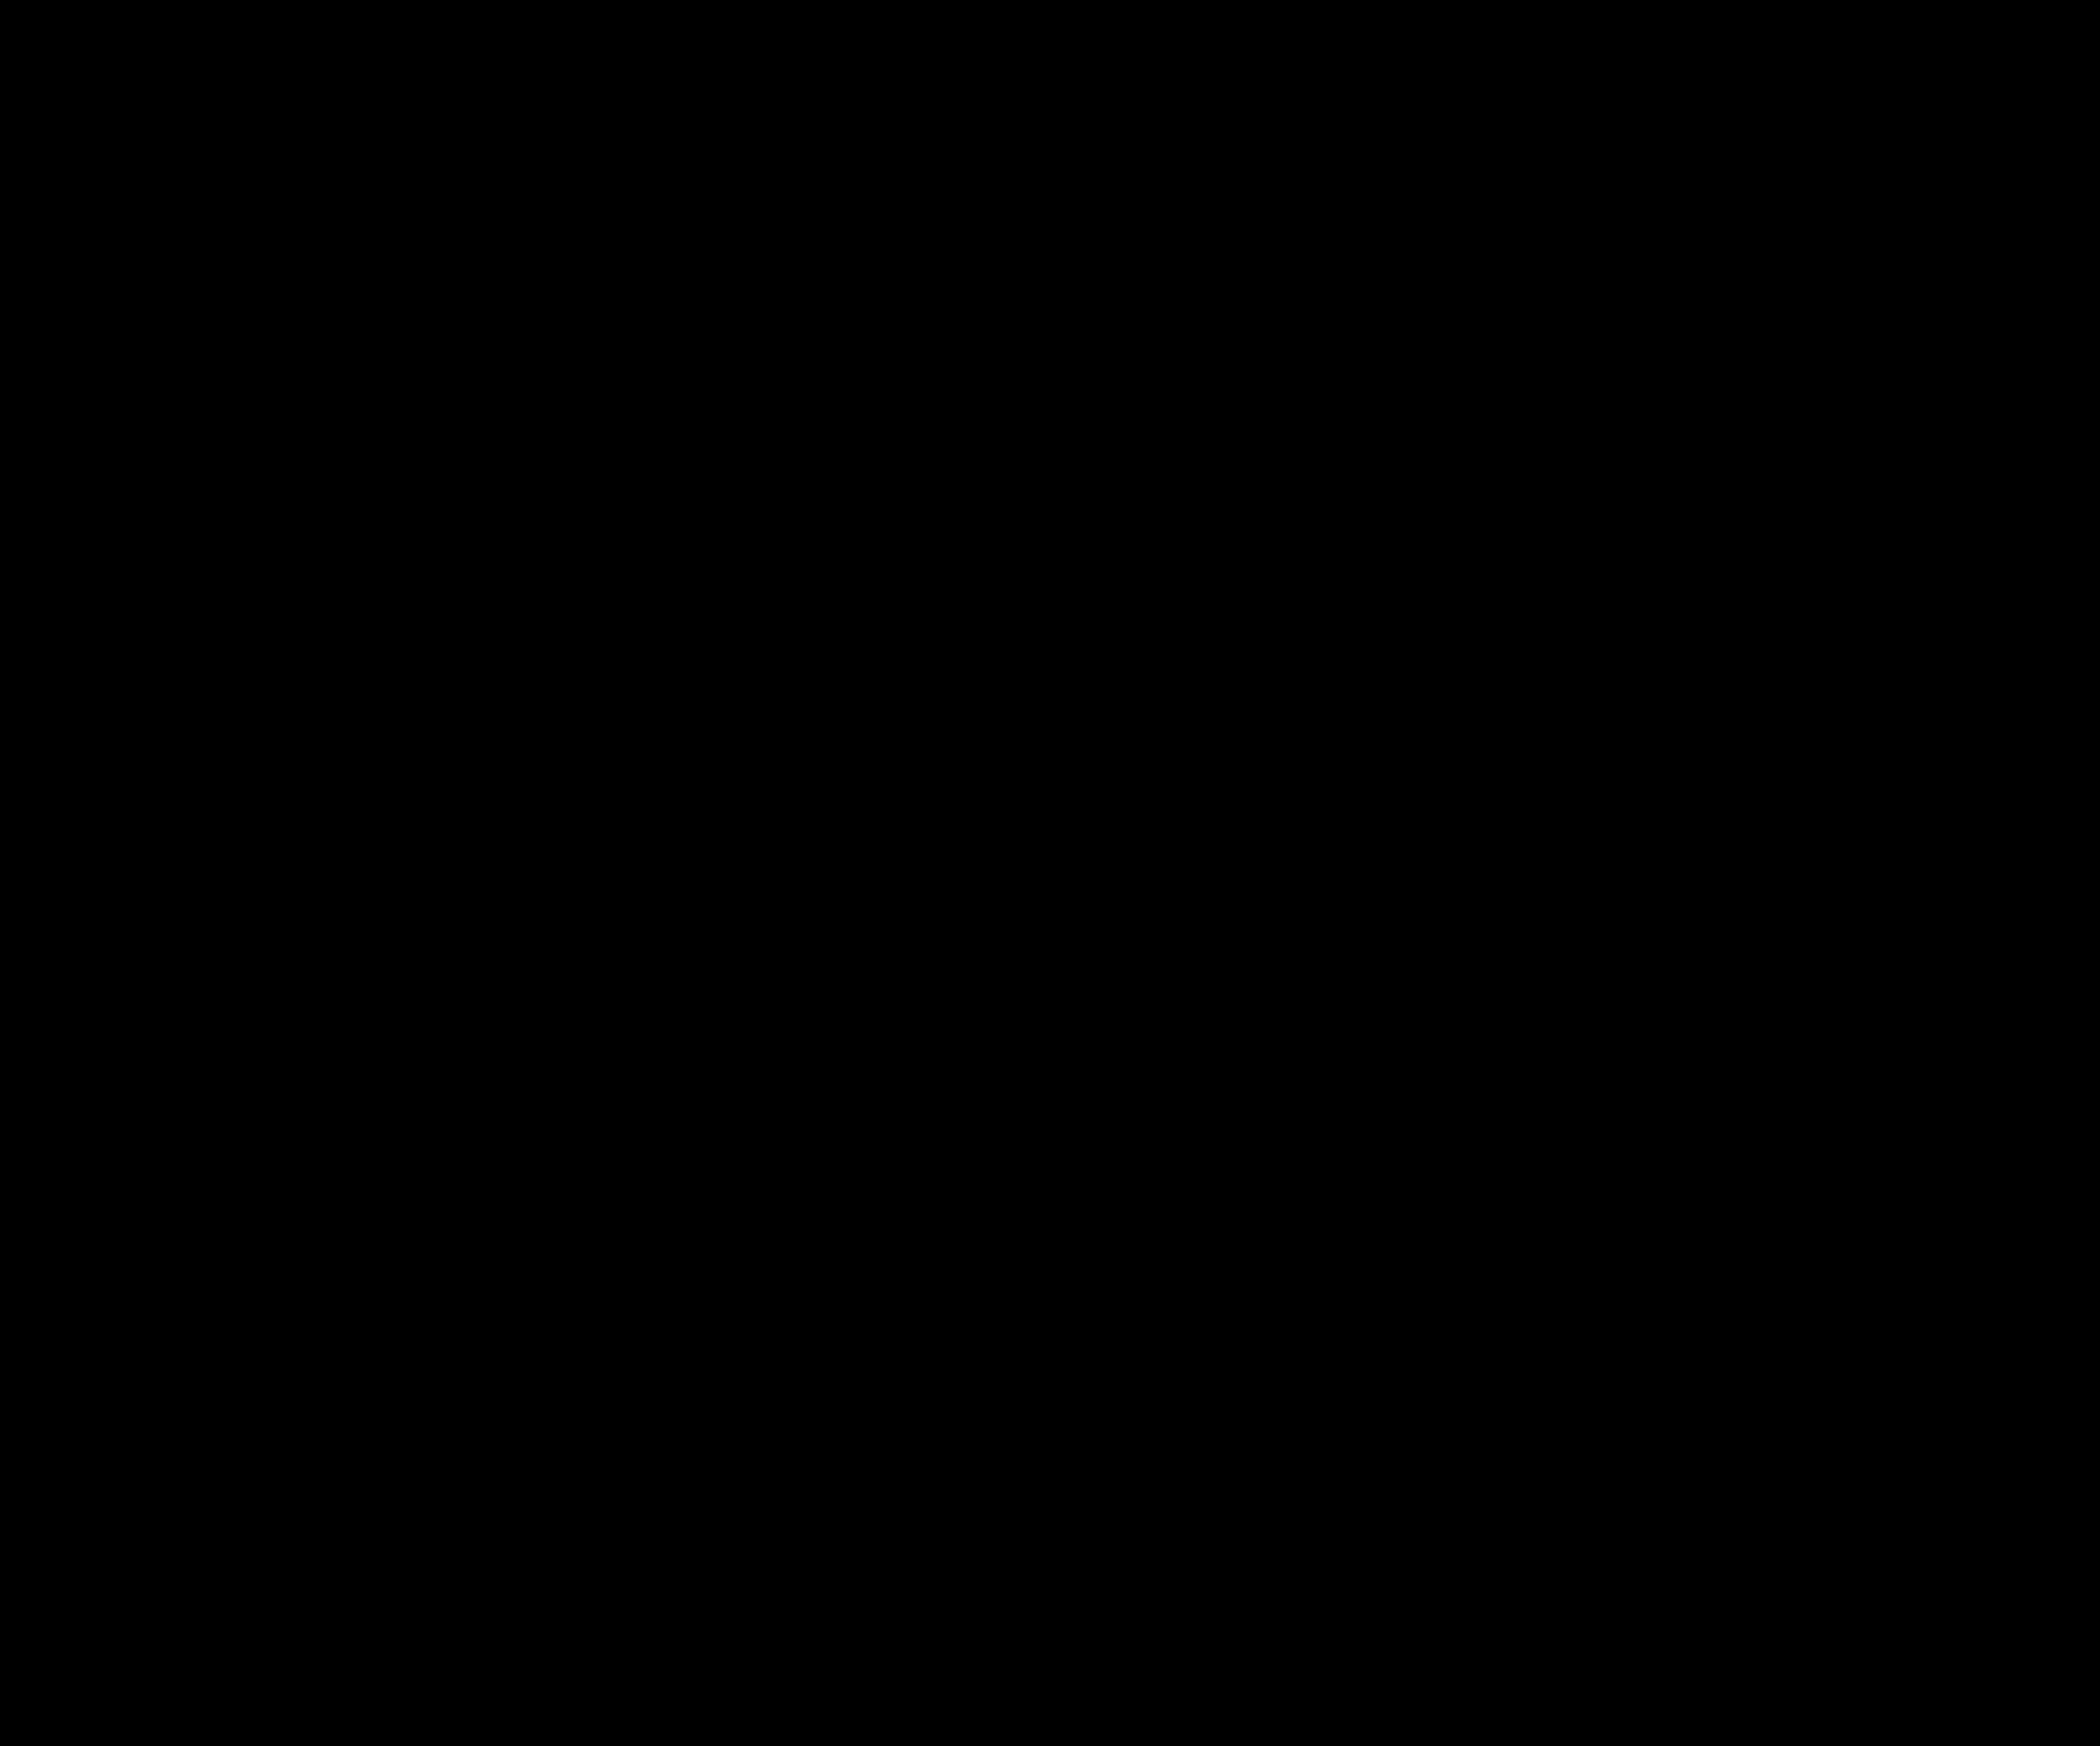 cropped-logo-noir-charte.png